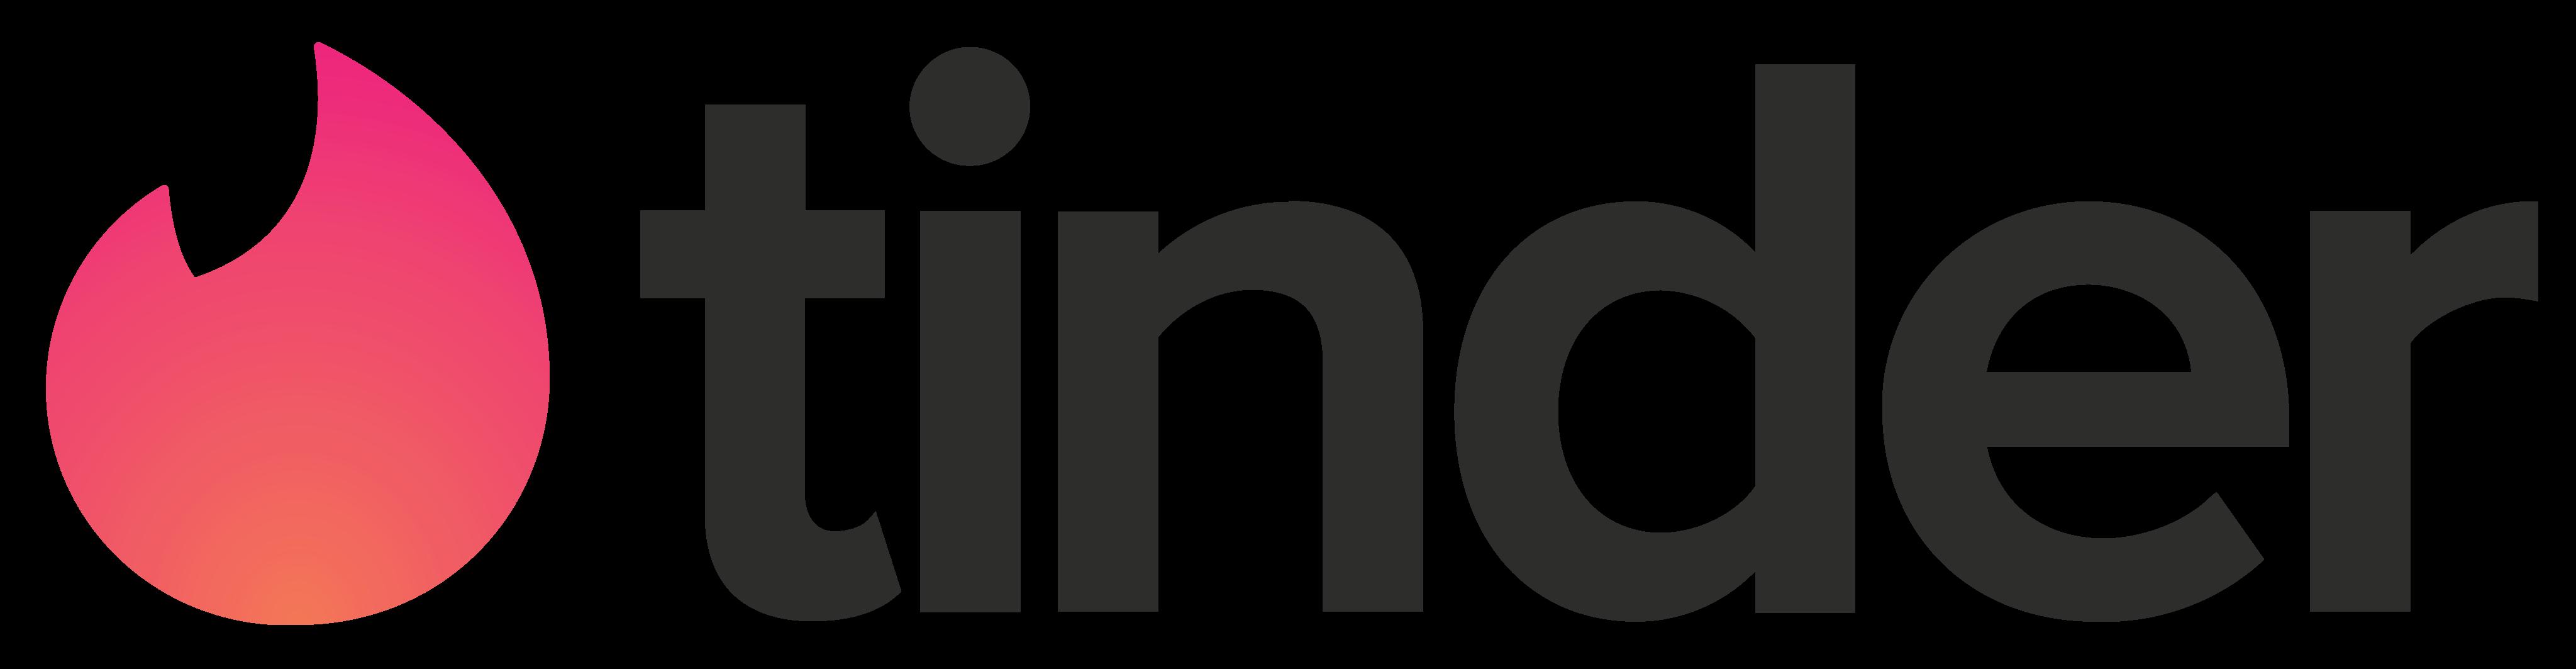 tinder logo - Tinder Logo